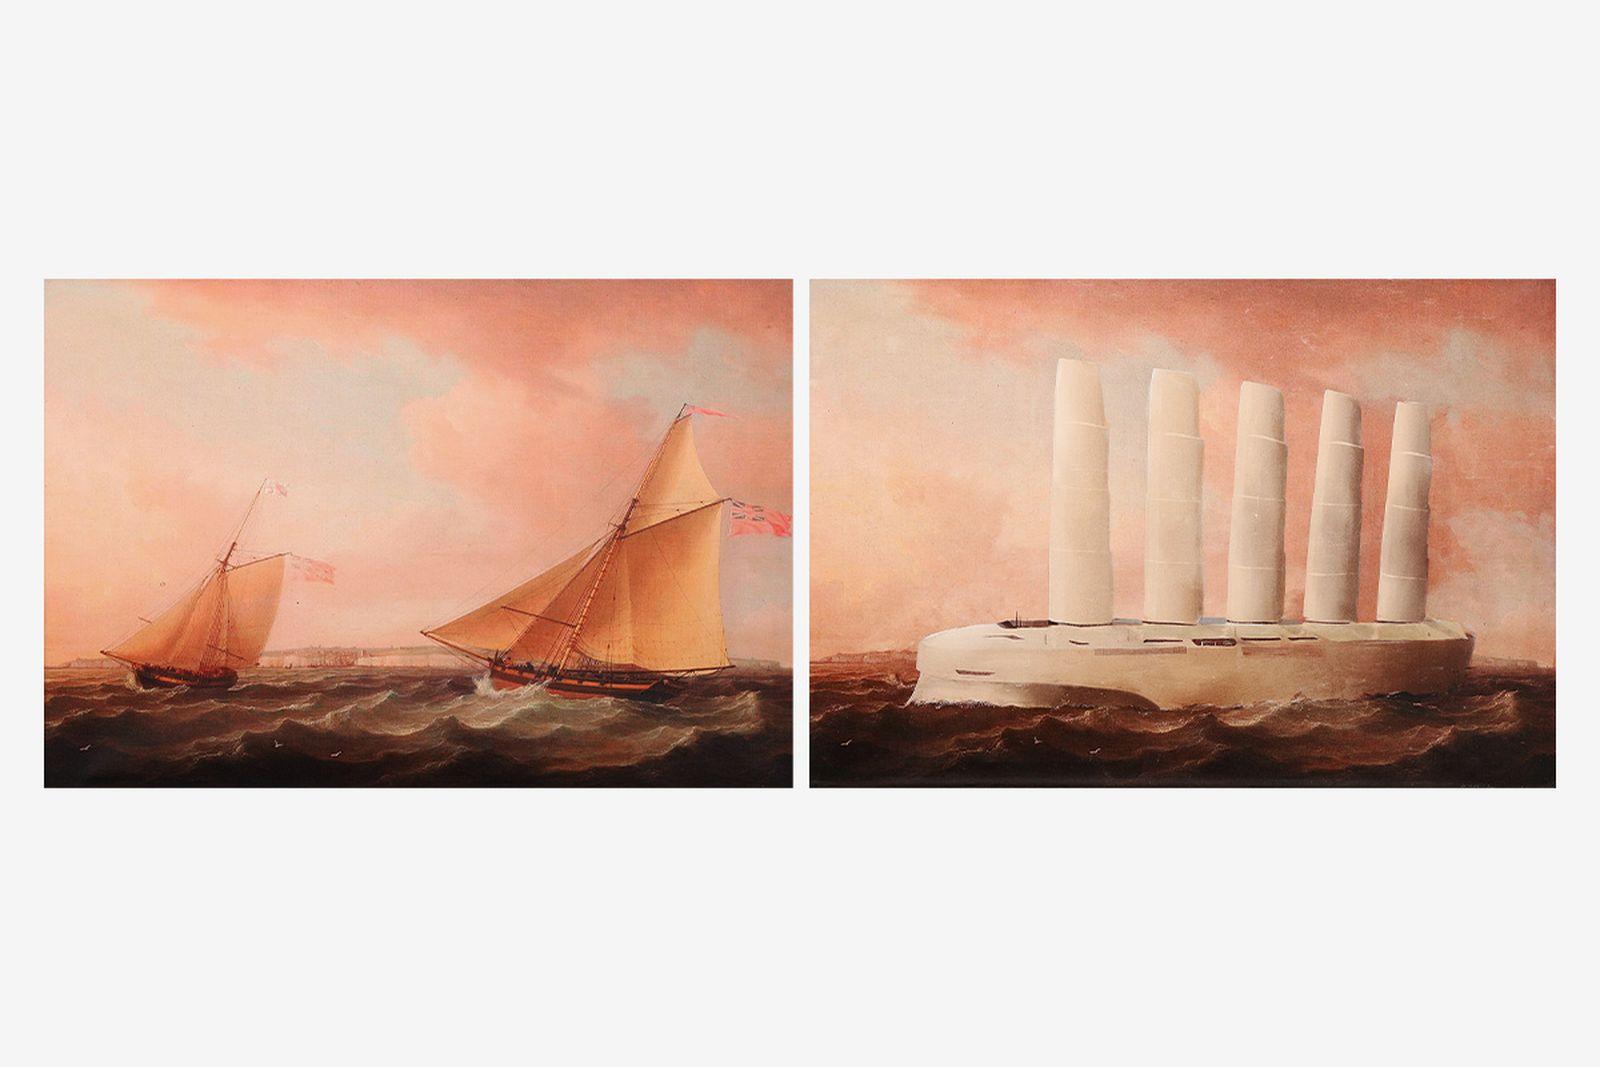 reuben-dangoor-taps-the-great-masters-to-imagine-future-seascapes-05